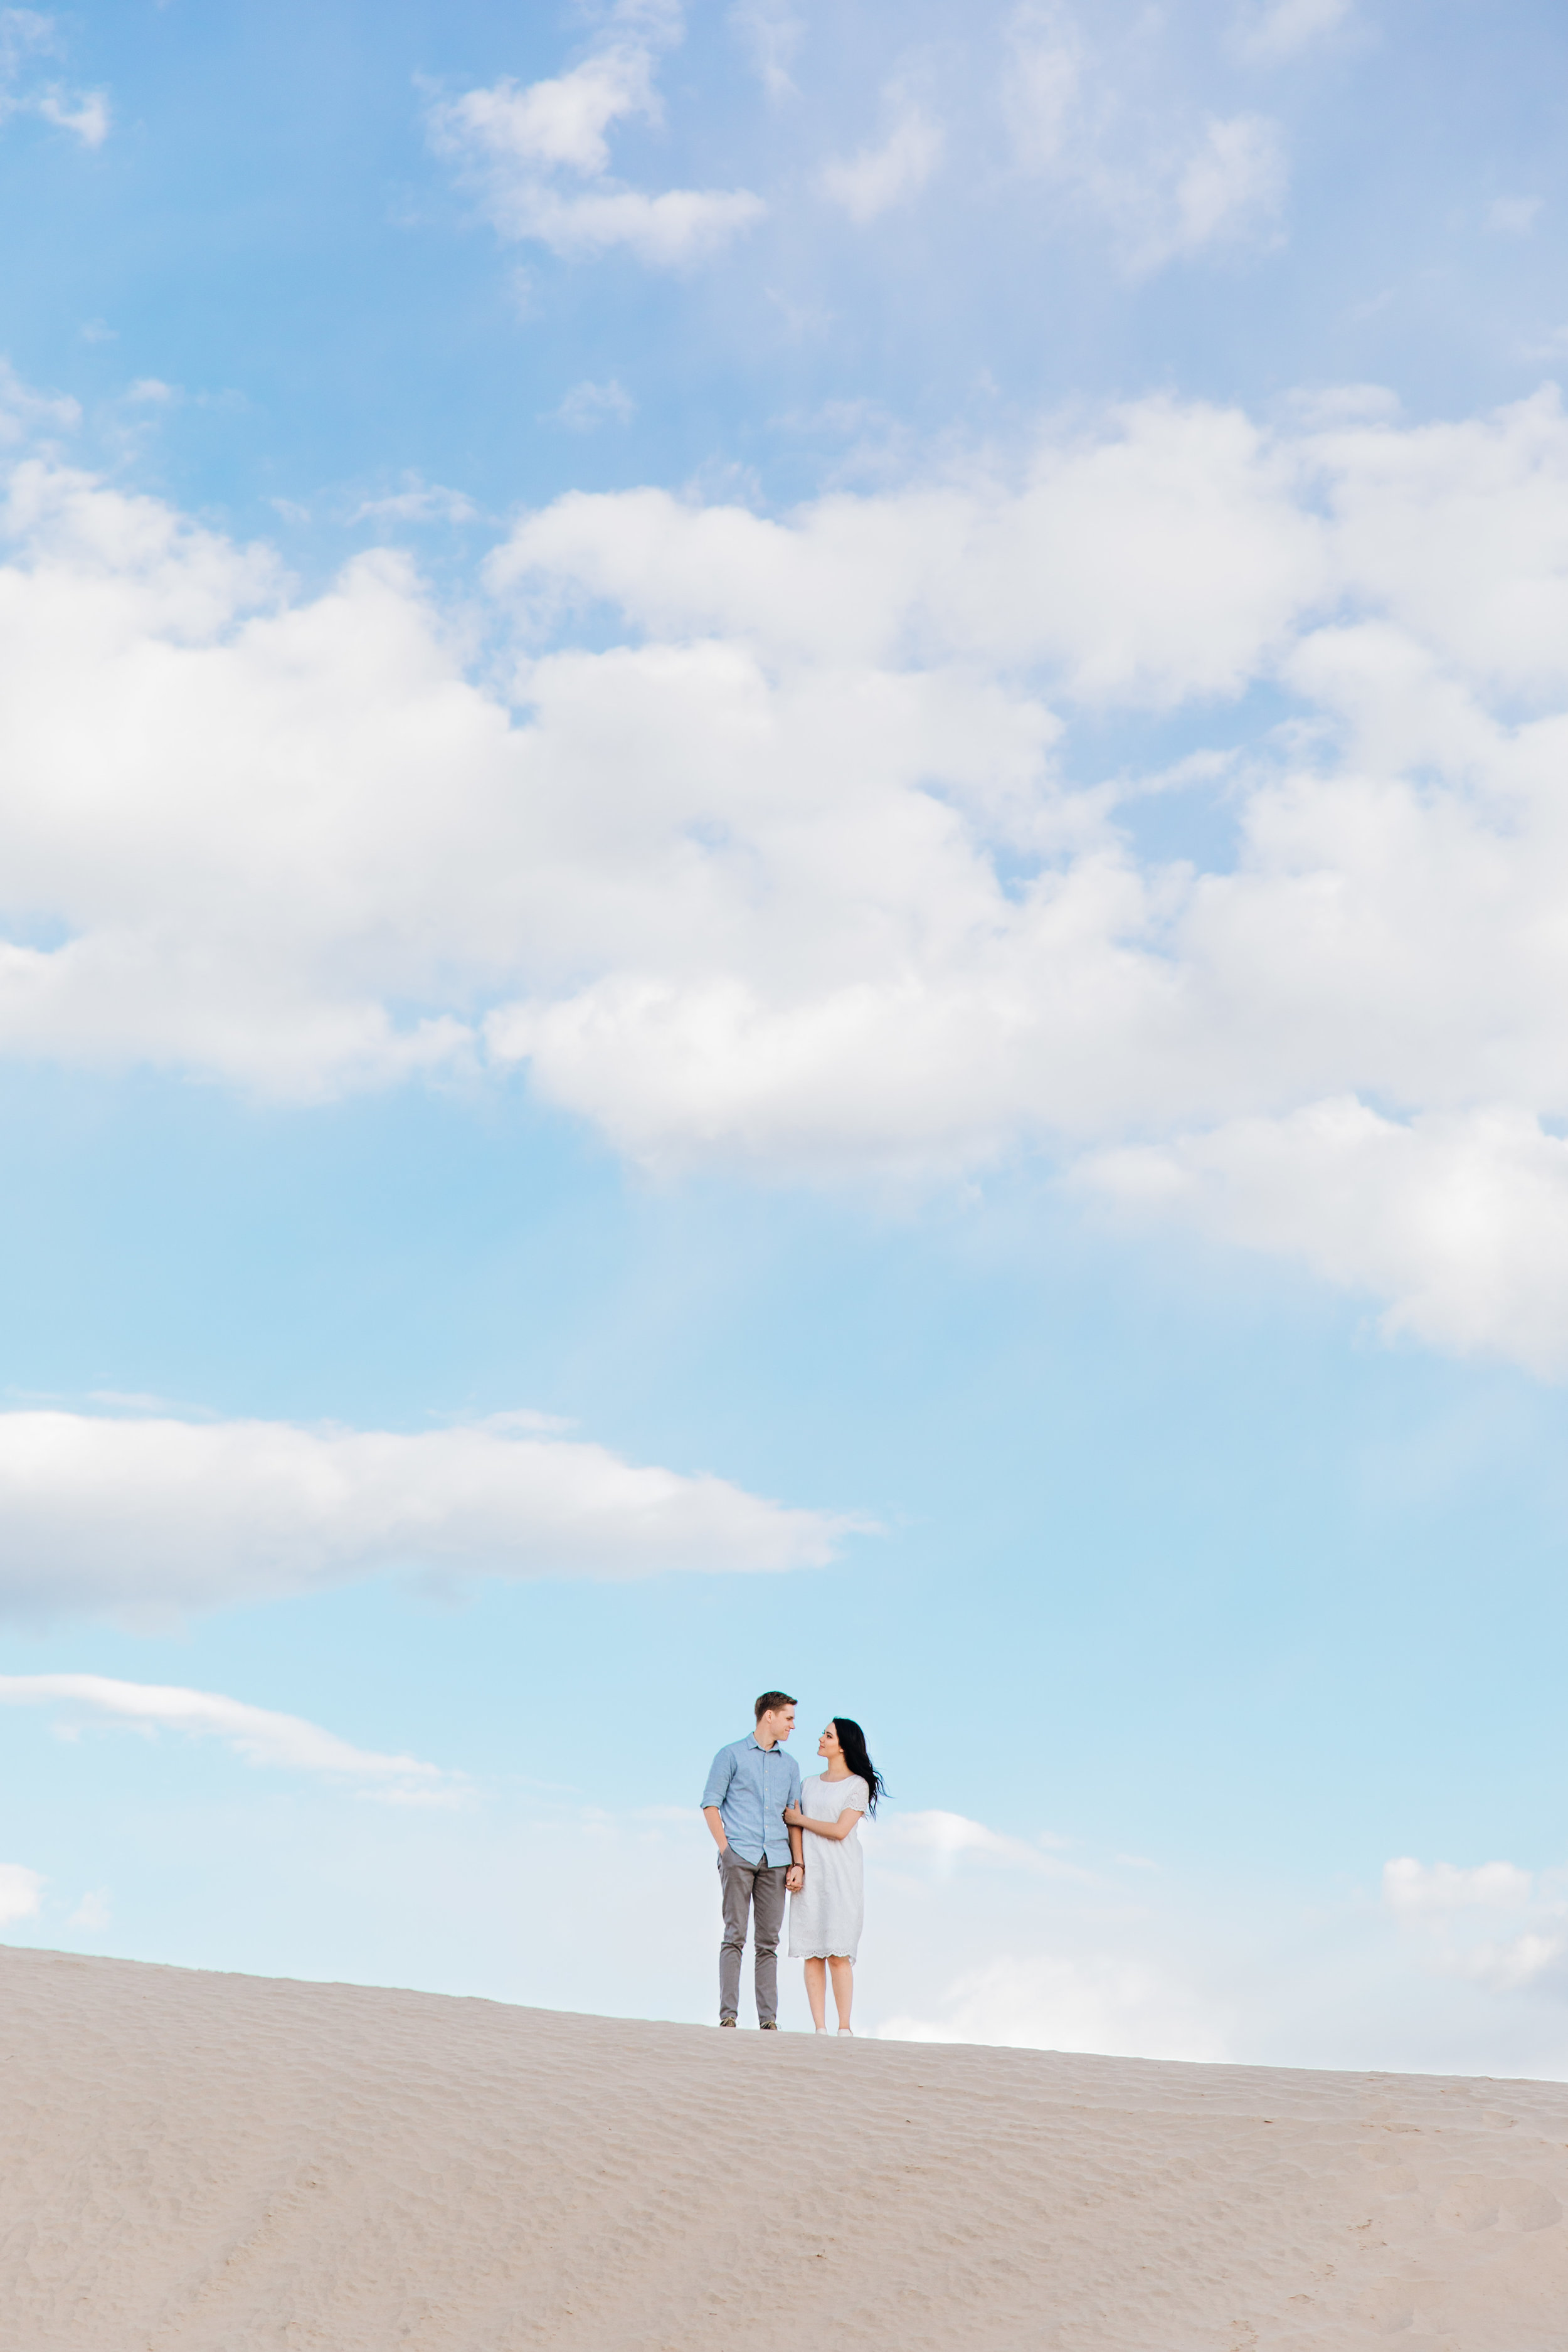 little-sahara-recreation-area-elopement-engagement-wedding-photography-michael-cozzens-9.jpg